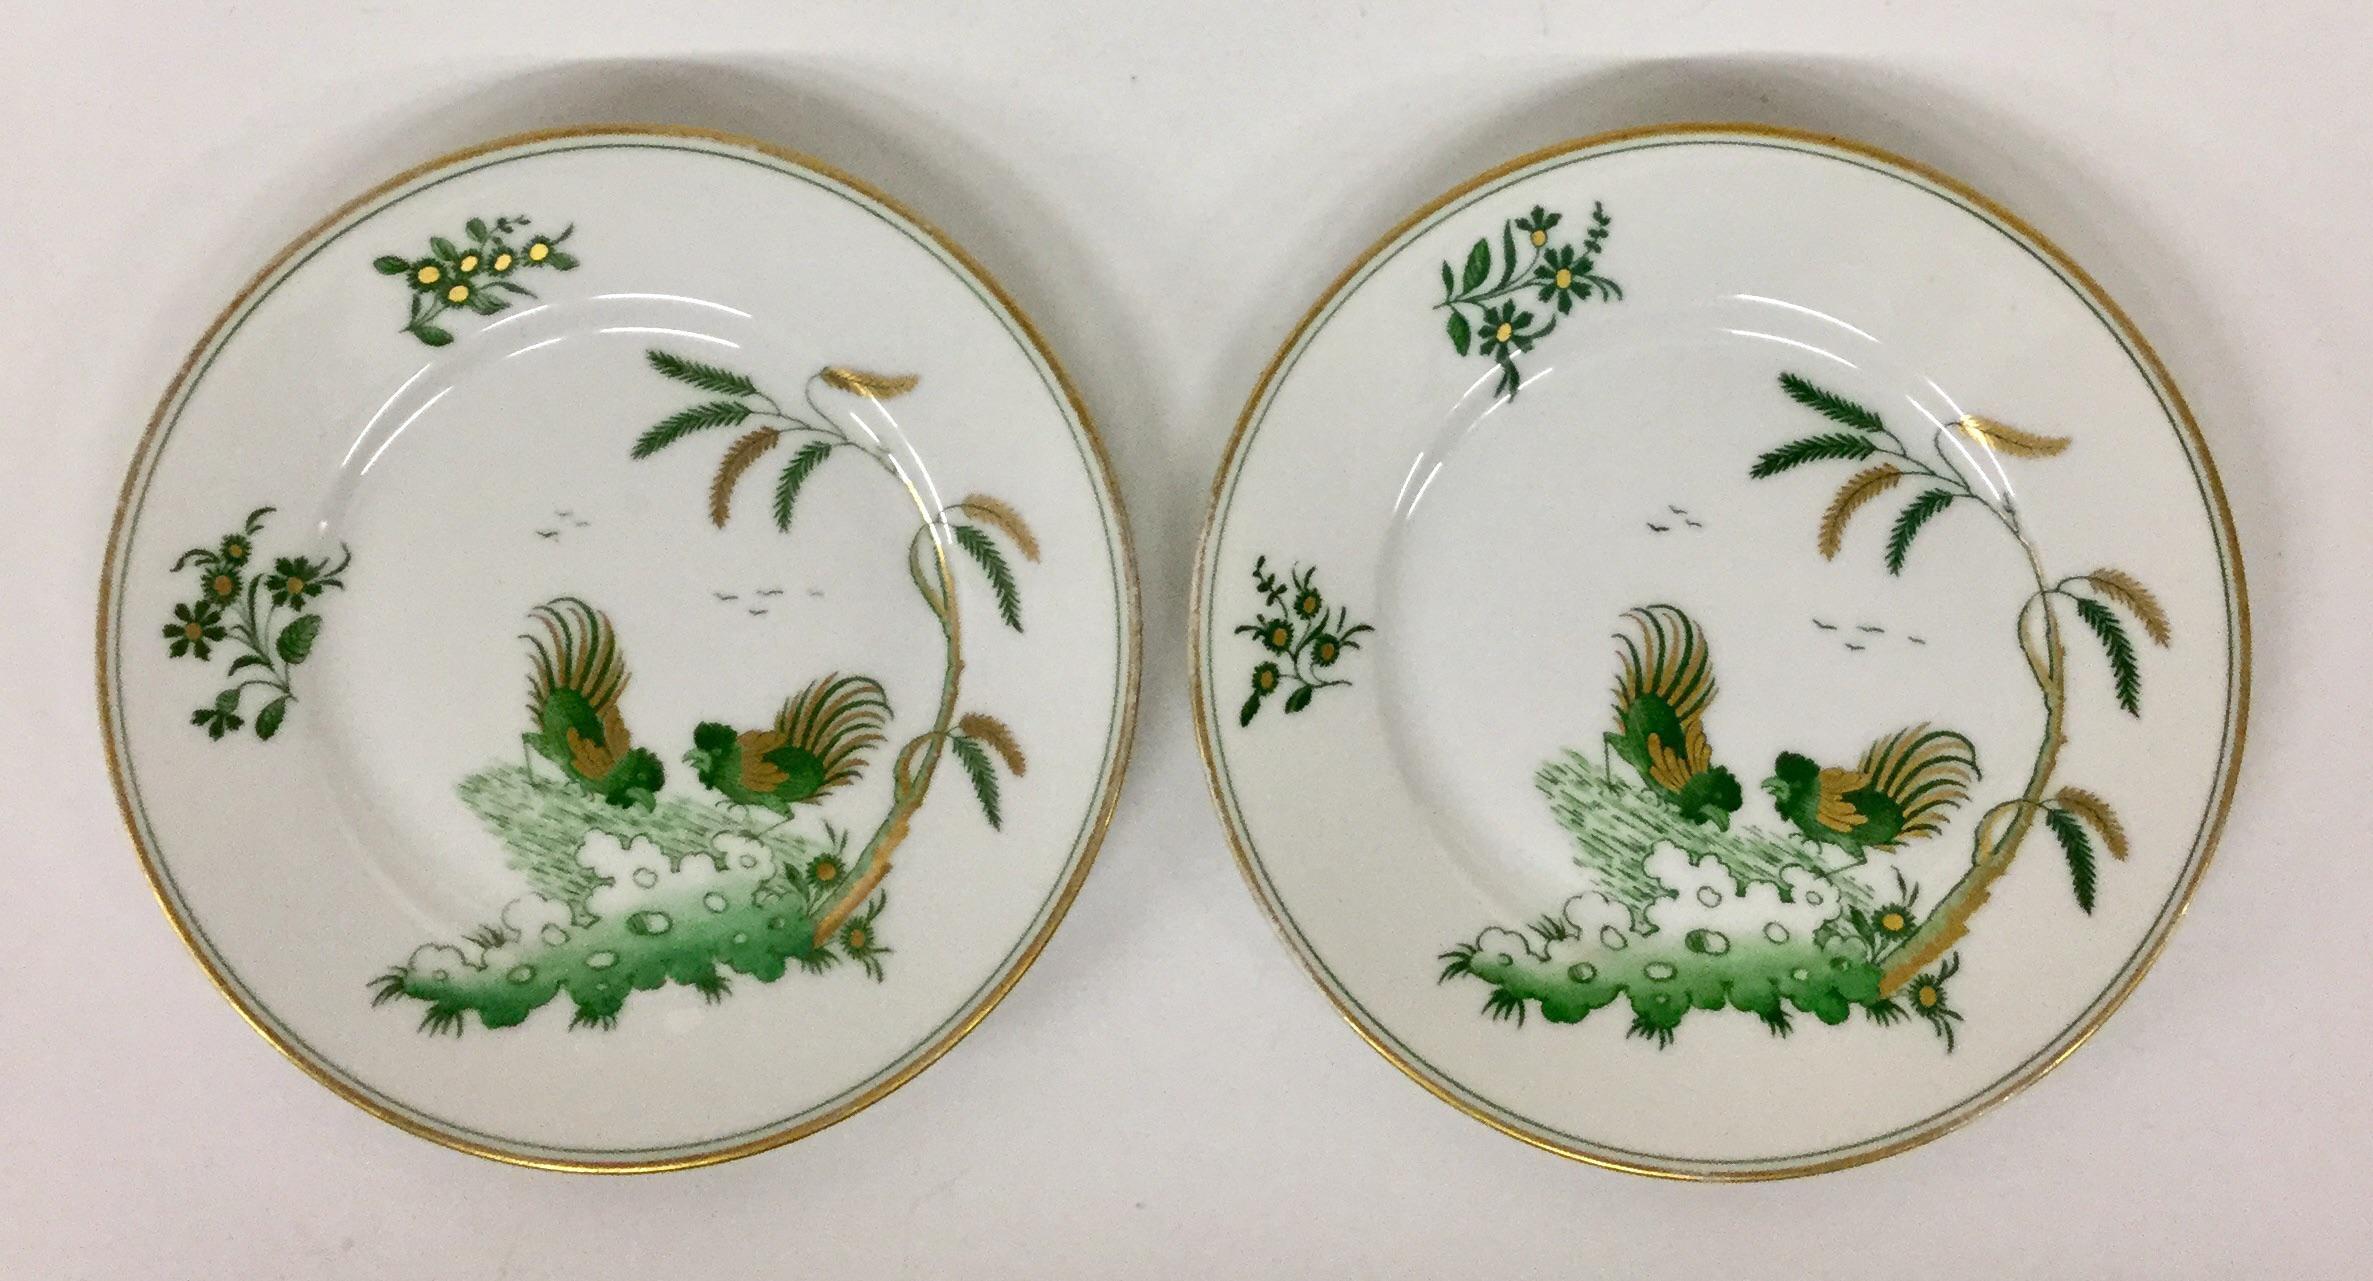 Richard Ginori Porcelain Plates - a Pair - Image 7 of 11  sc 1 st  Chairish & Richard Ginori Porcelain Plates - a Pair   Chairish